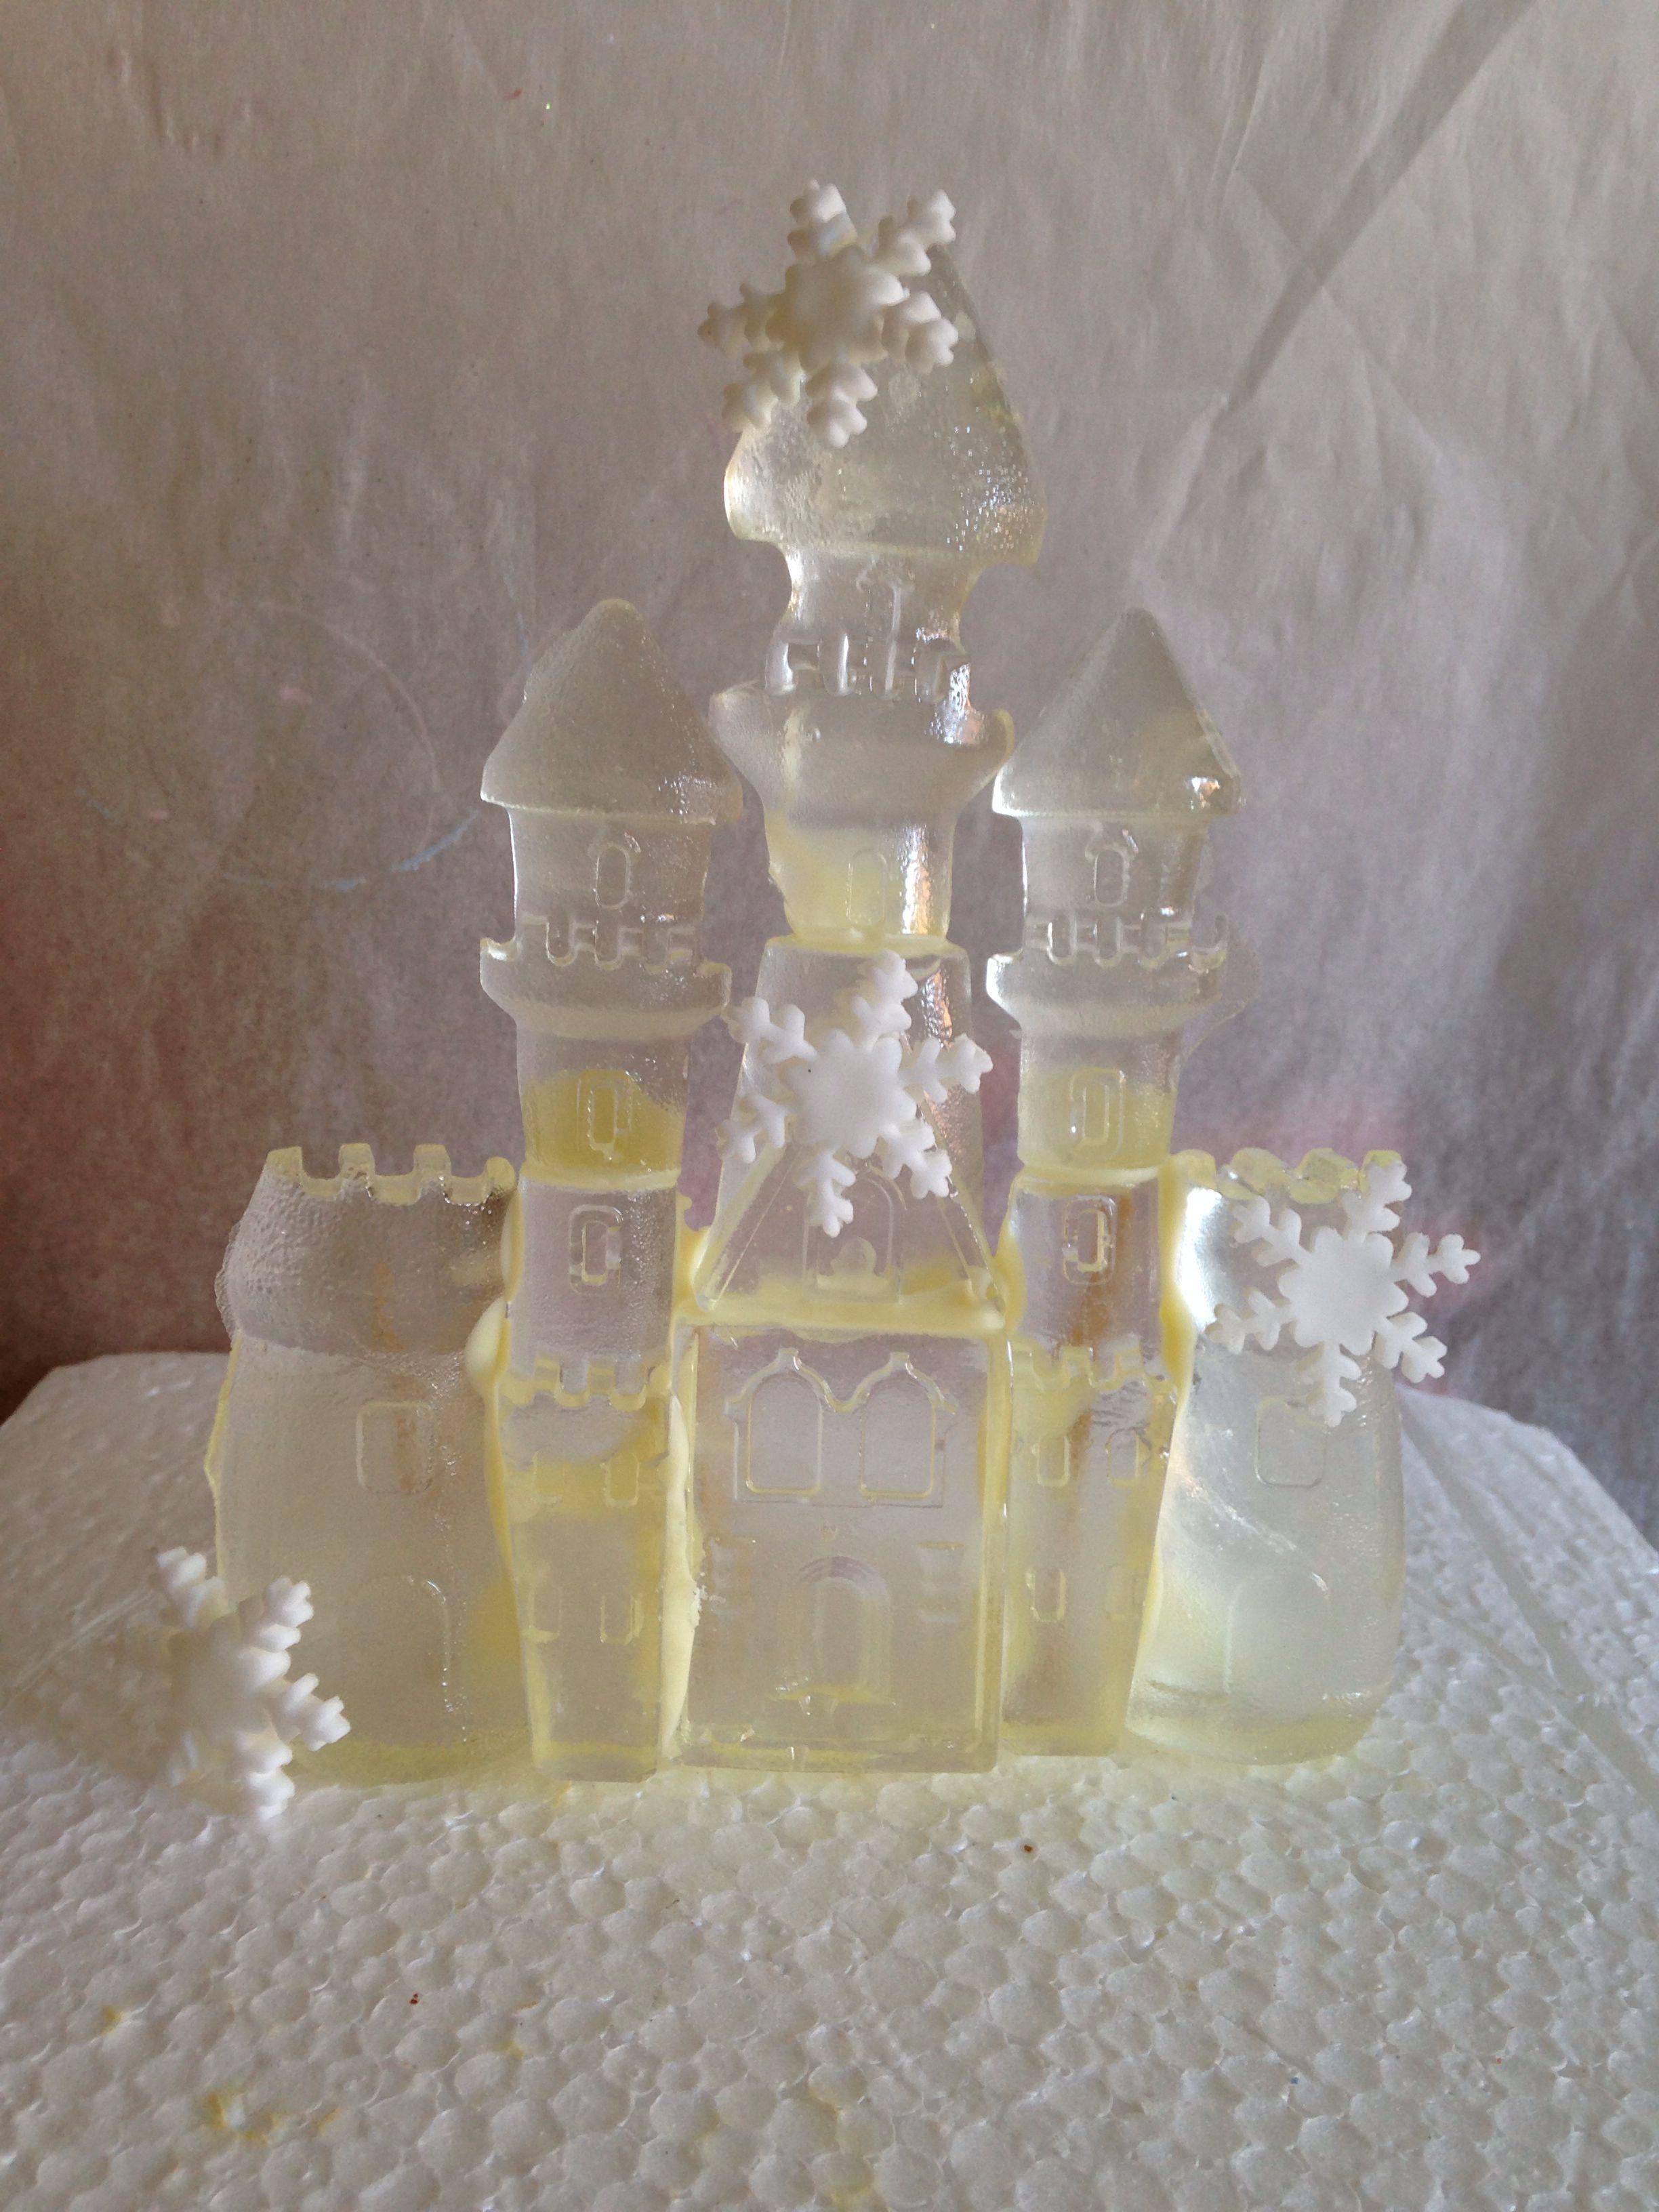 Frozen Castle Cake Topper Frozen Castle Cake Edible Cups Frozen Castle